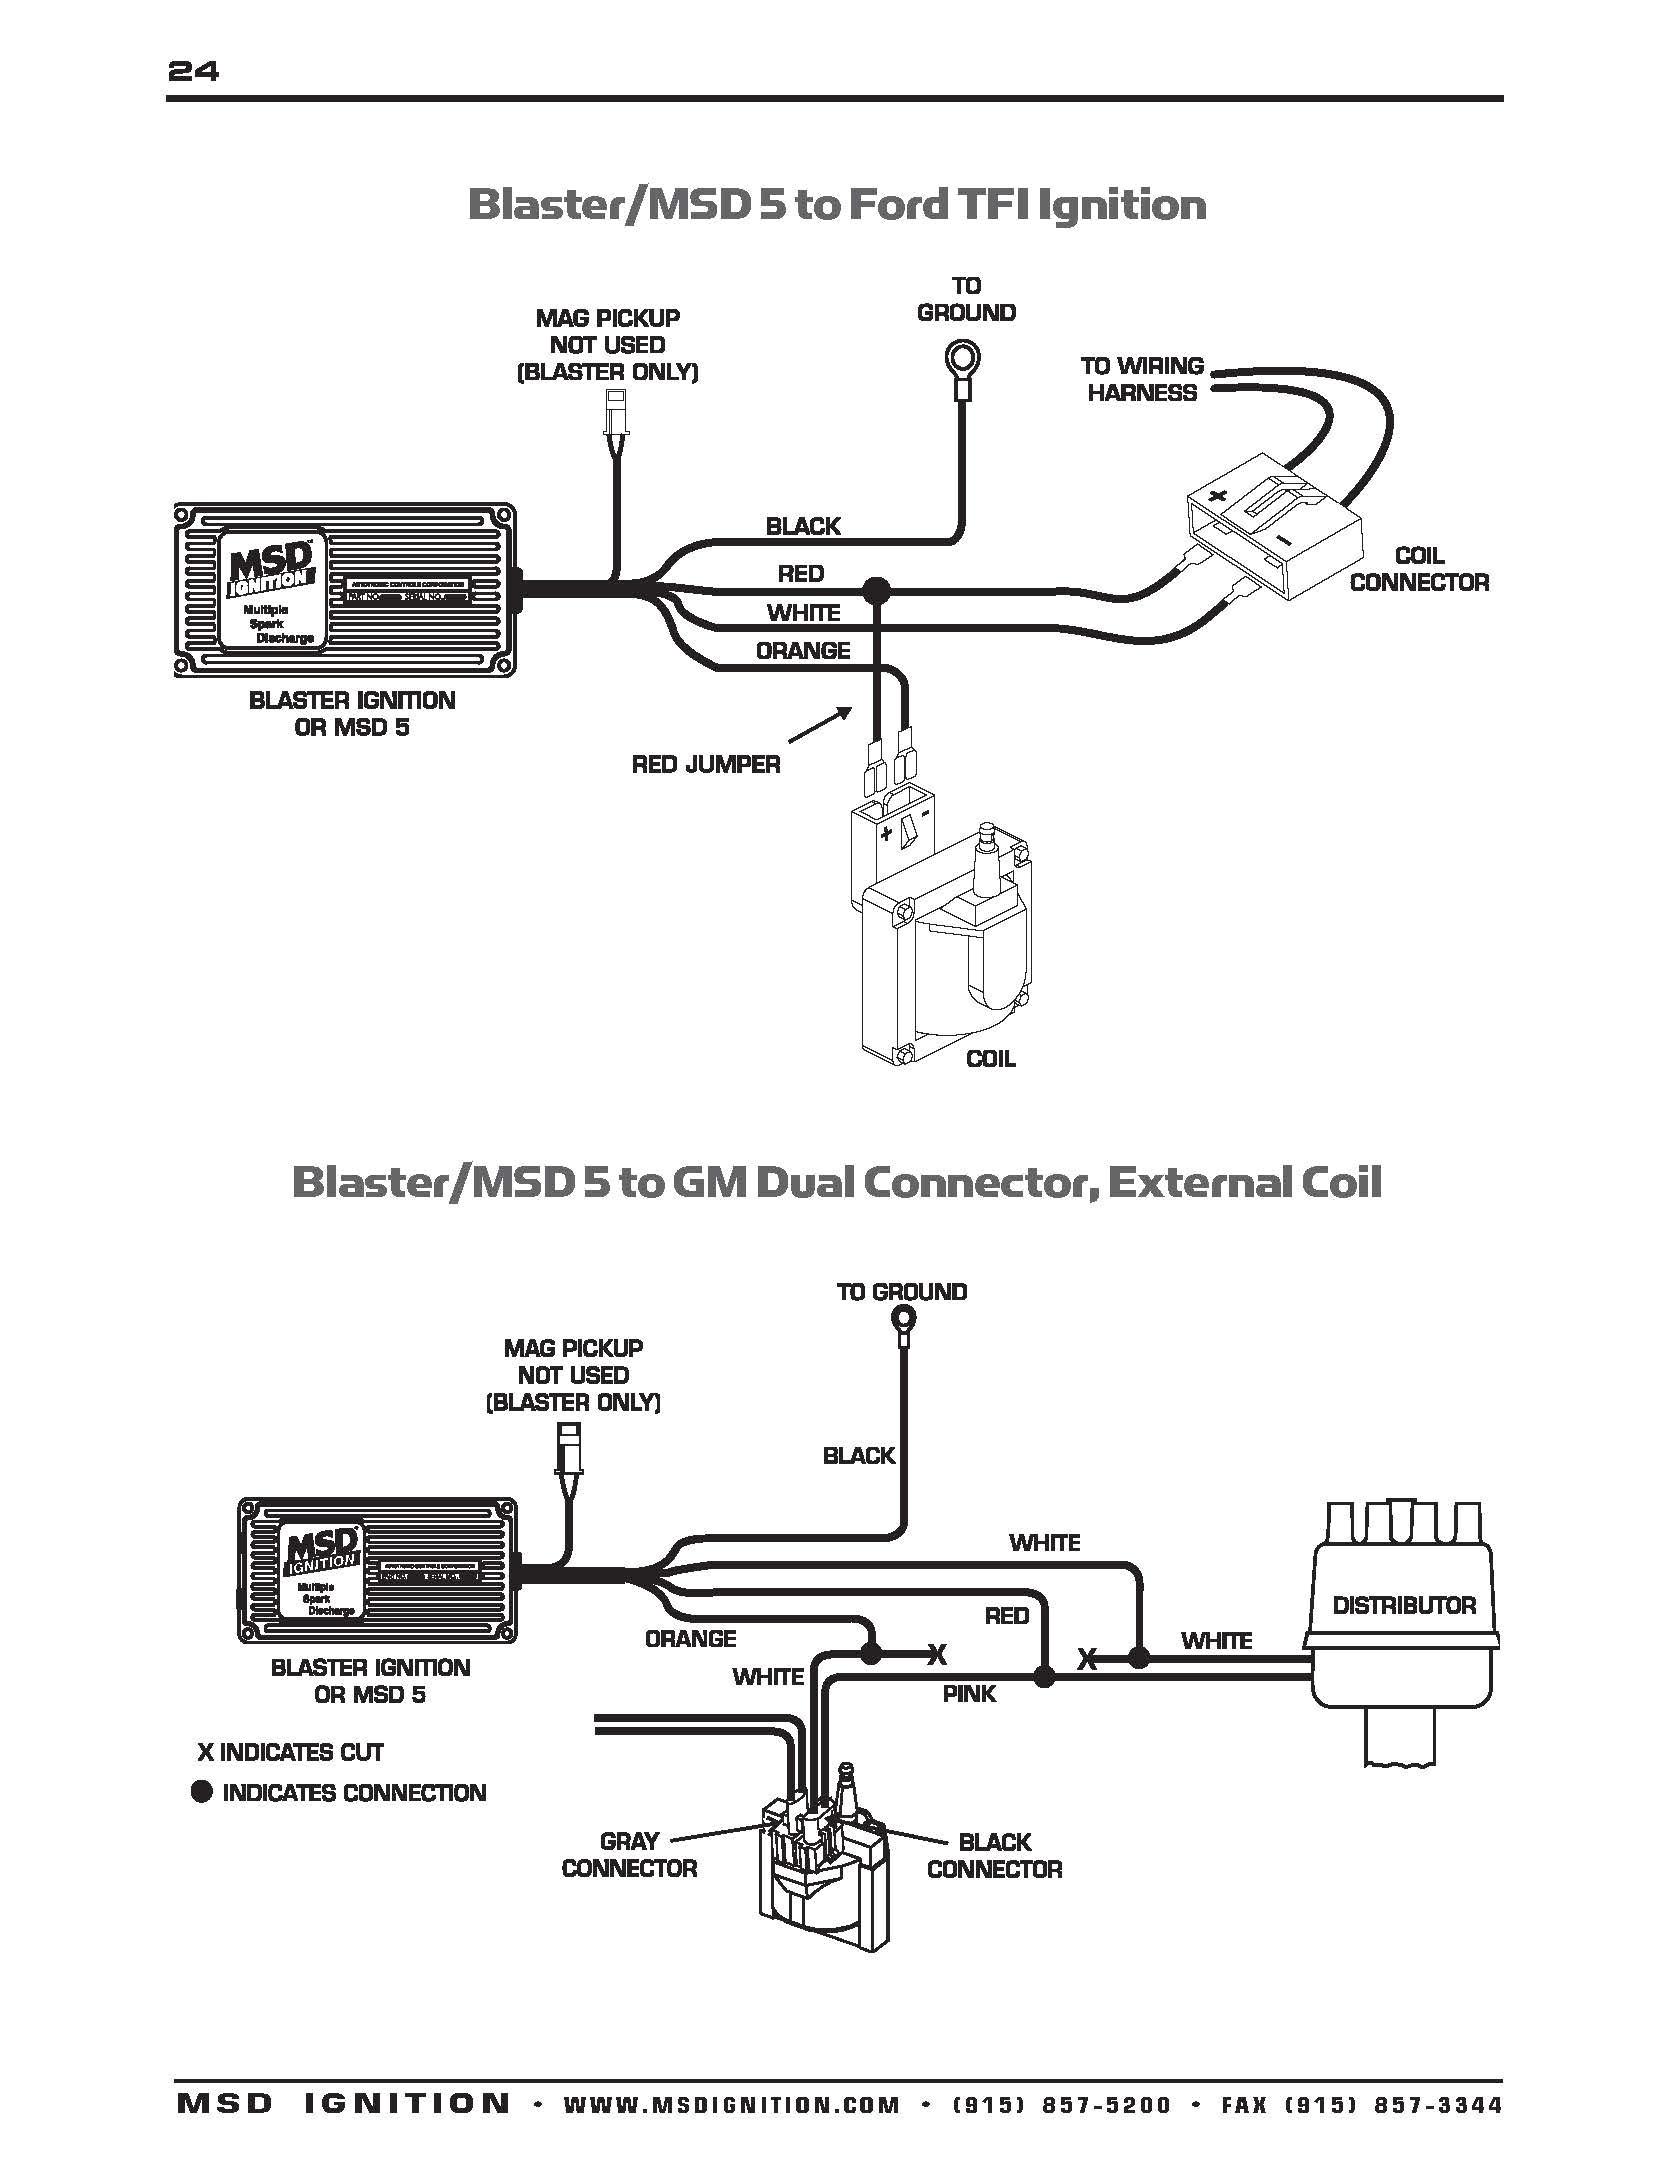 msd coil wiring diagram wiring diagram msd coil wiring diagram wiring diagram name mix msd coil